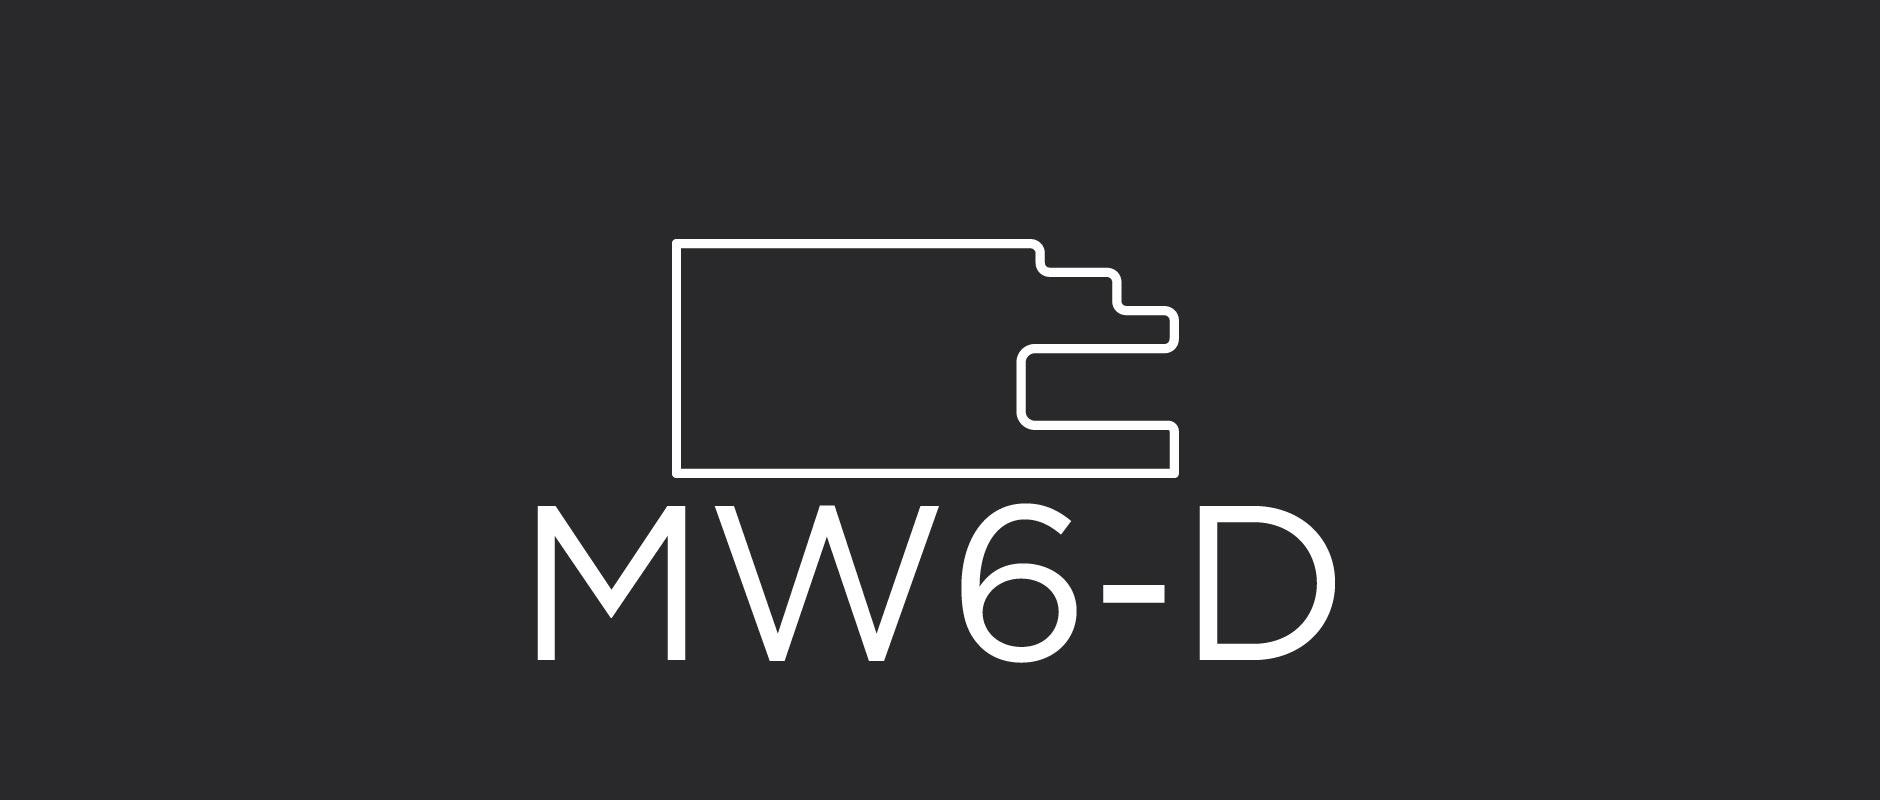 "MW6-D mitered drawer front frame 1-5/8"" wide"